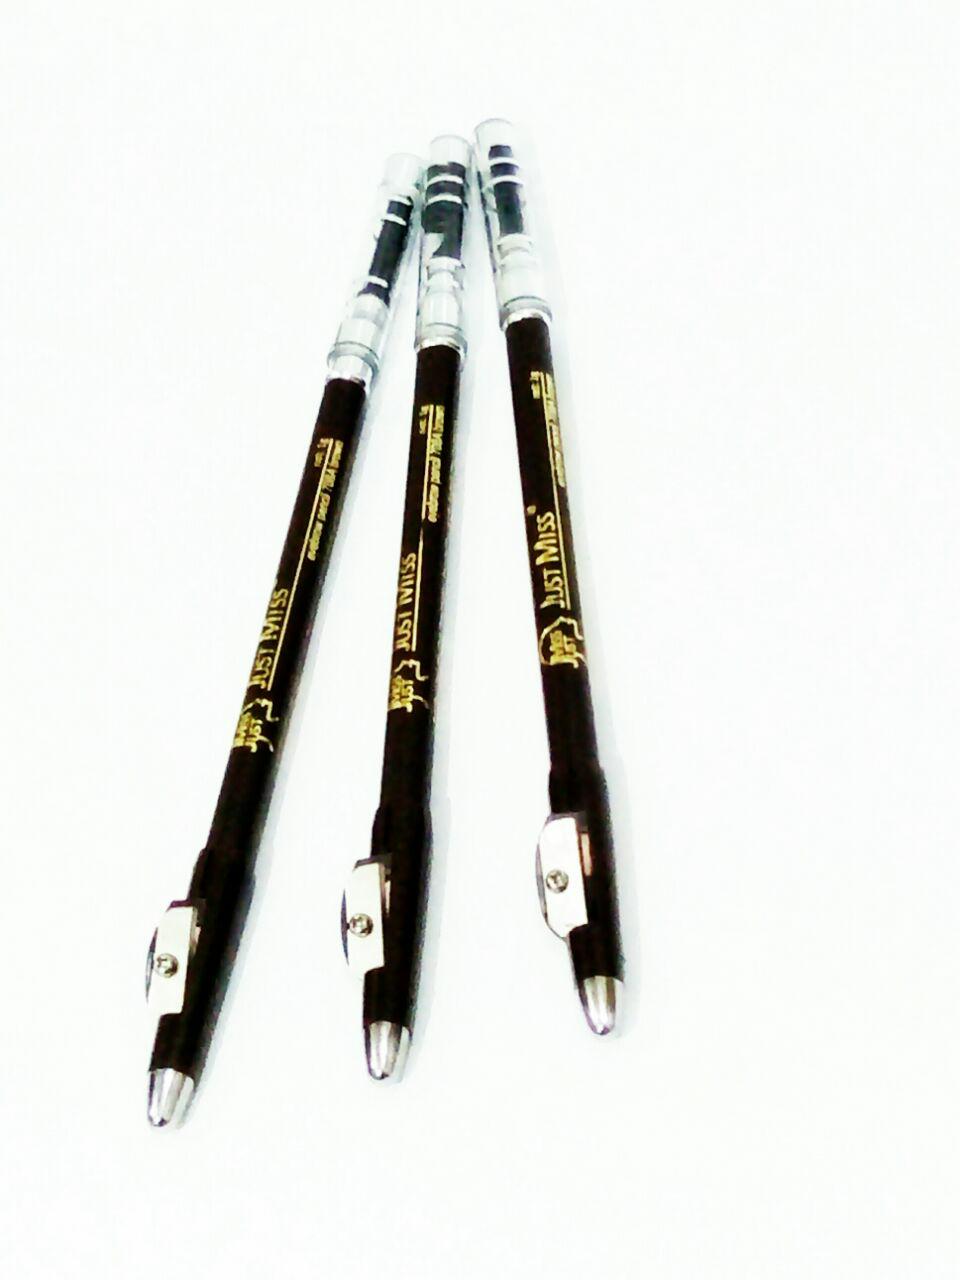 Jual Pensil Alis Just Miss Pencil Serutan Sikat E1no5 Tokopedia